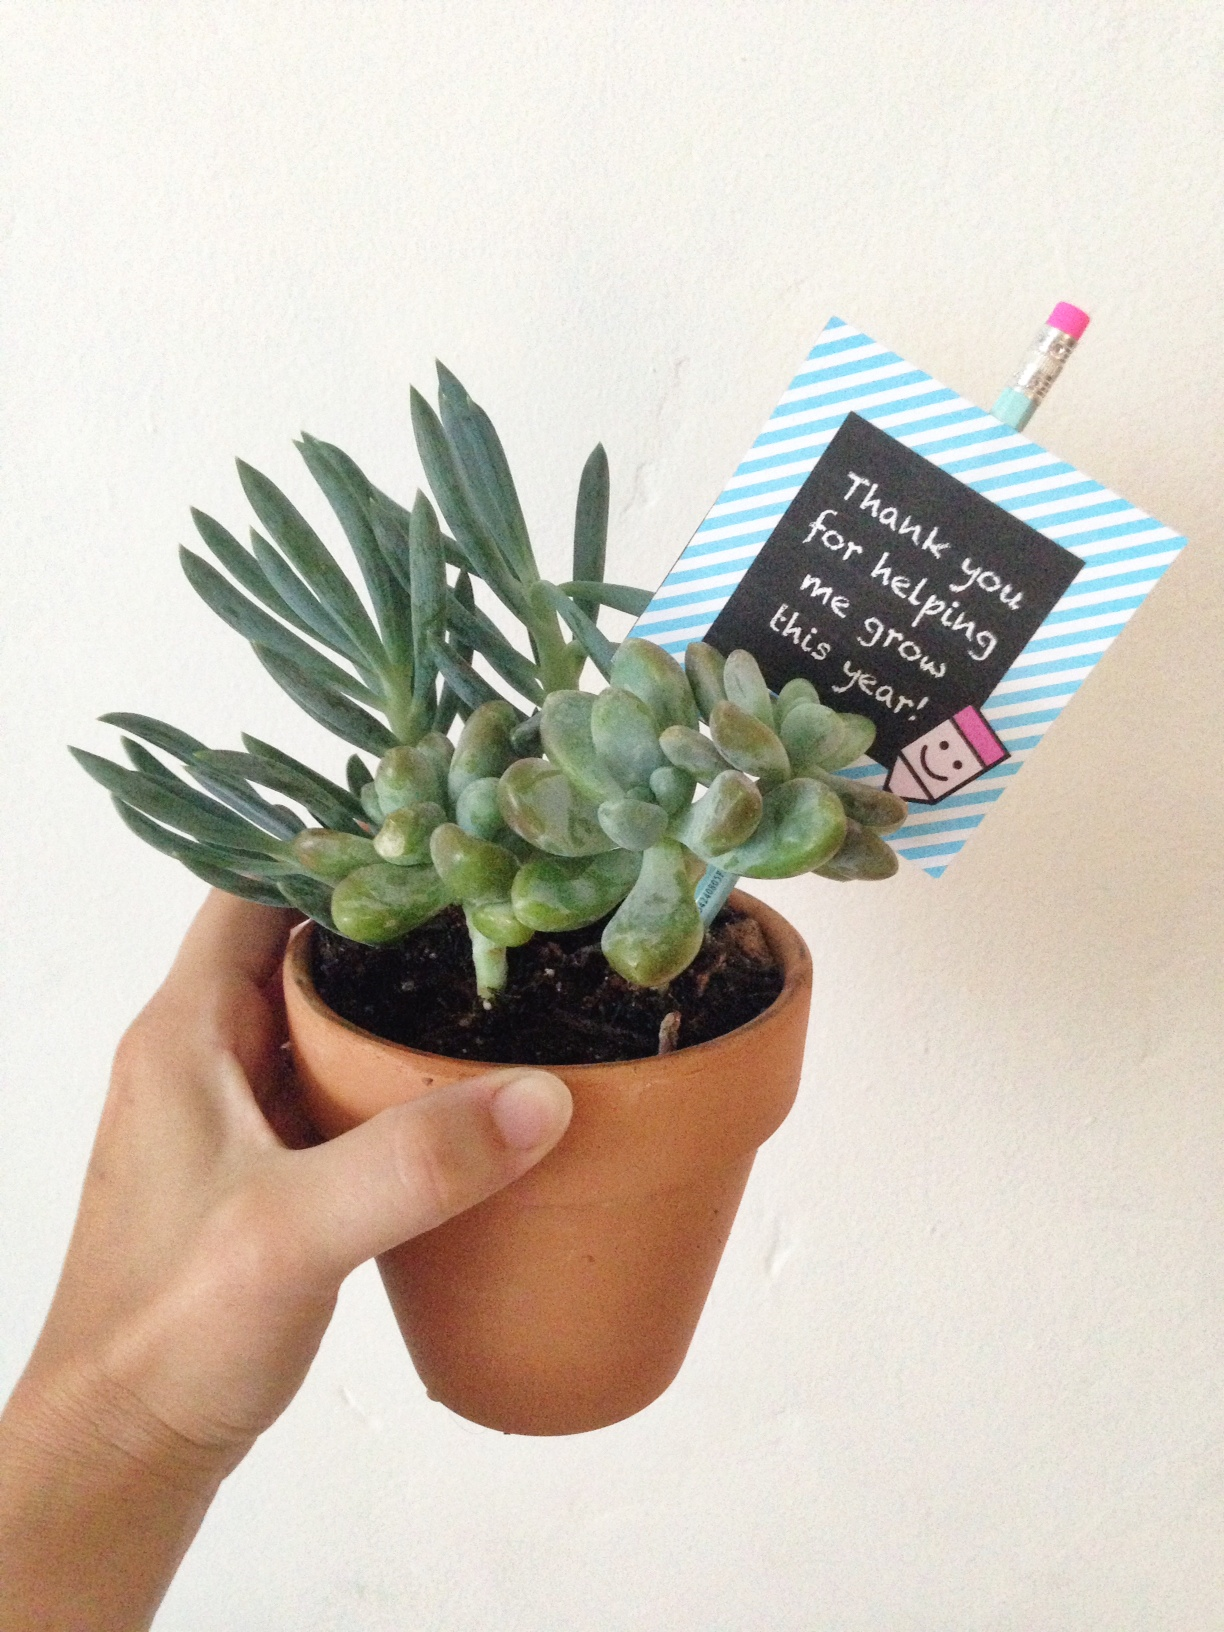 preschool teacher gift idea | Oh Lovely Day